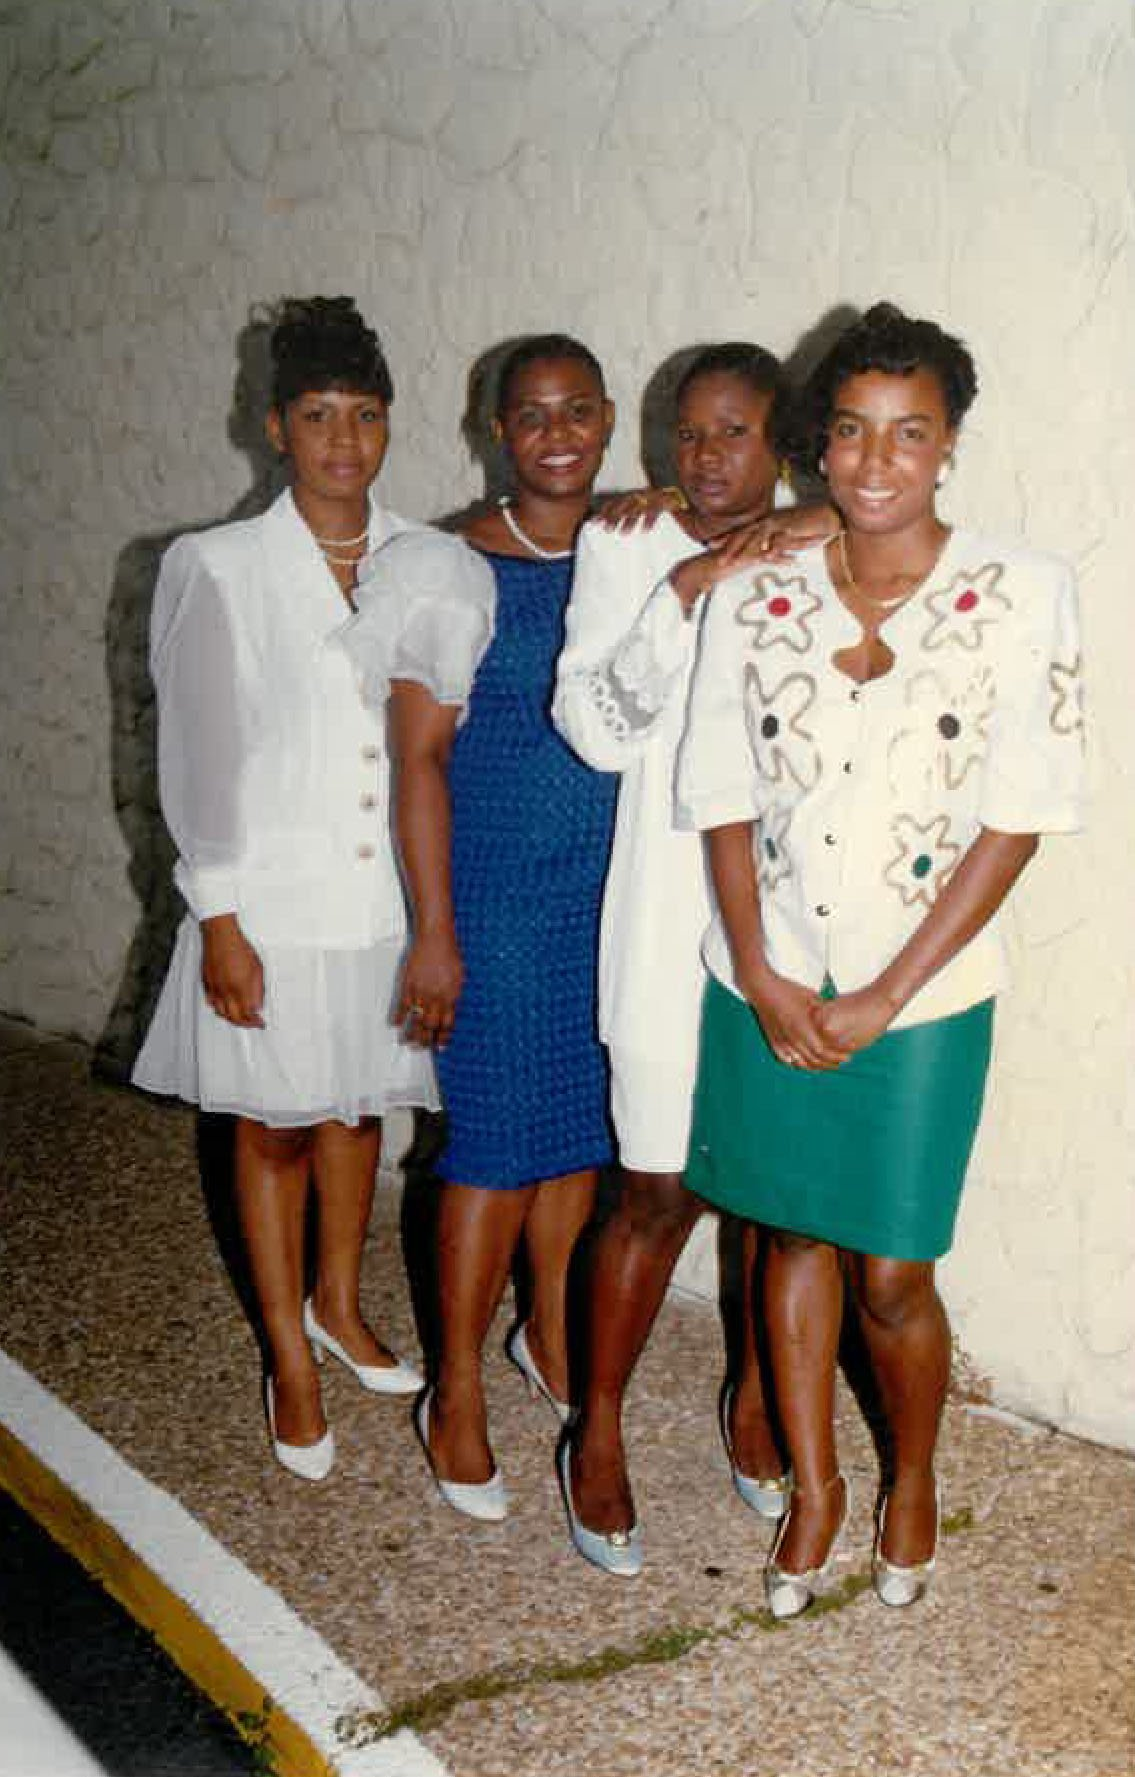 Family photo of 4 women